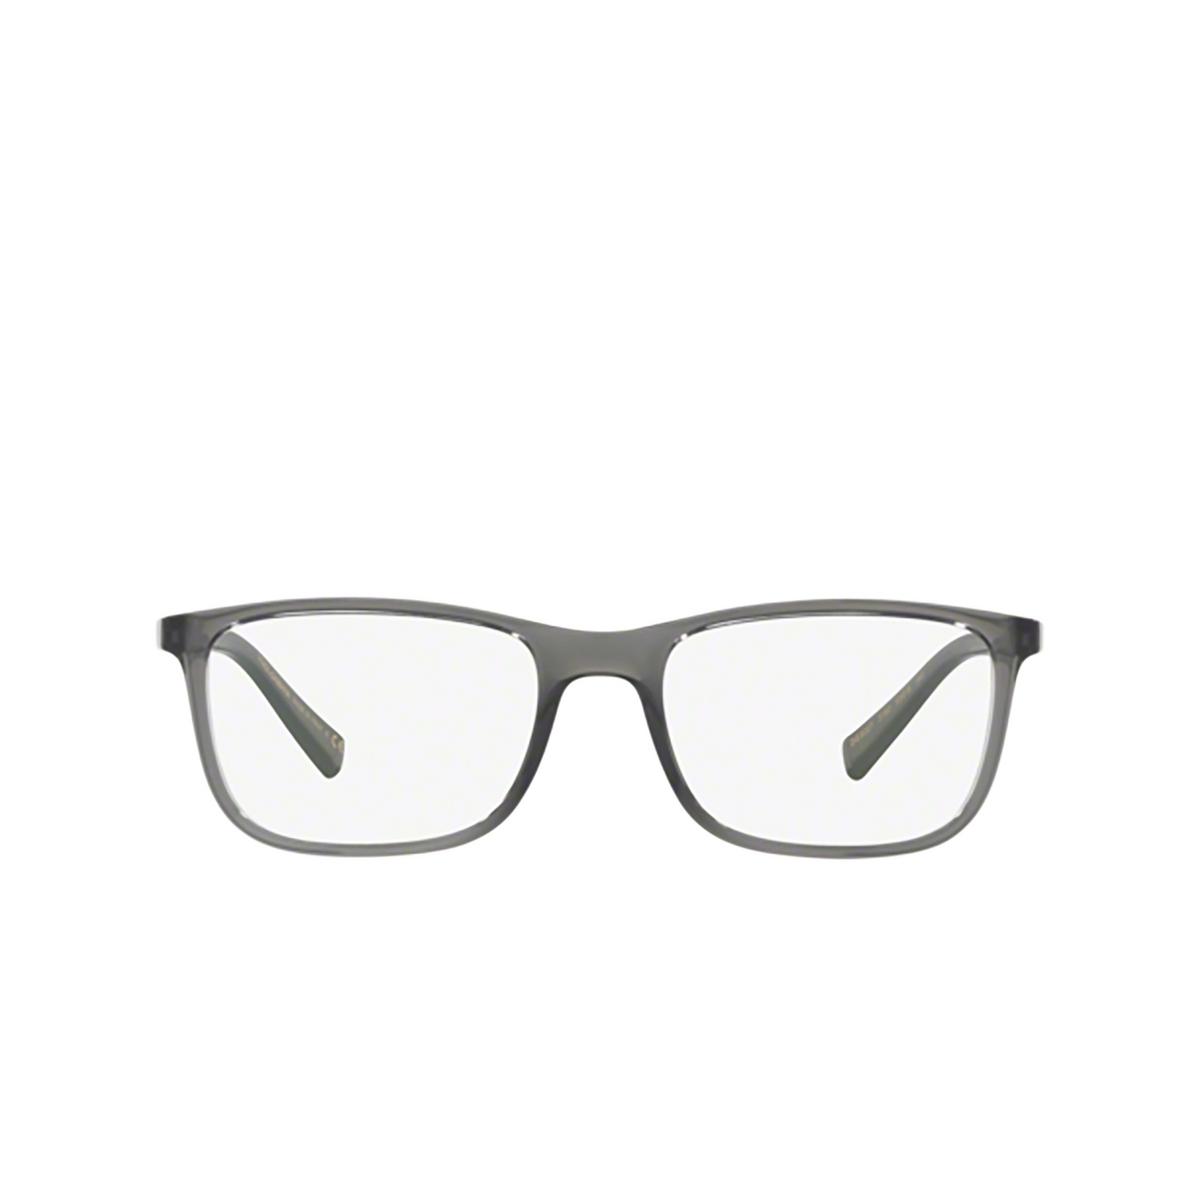 Dolce & Gabbana® Square Eyeglasses: DG5027 color Transparent Grey 3160 - front view.